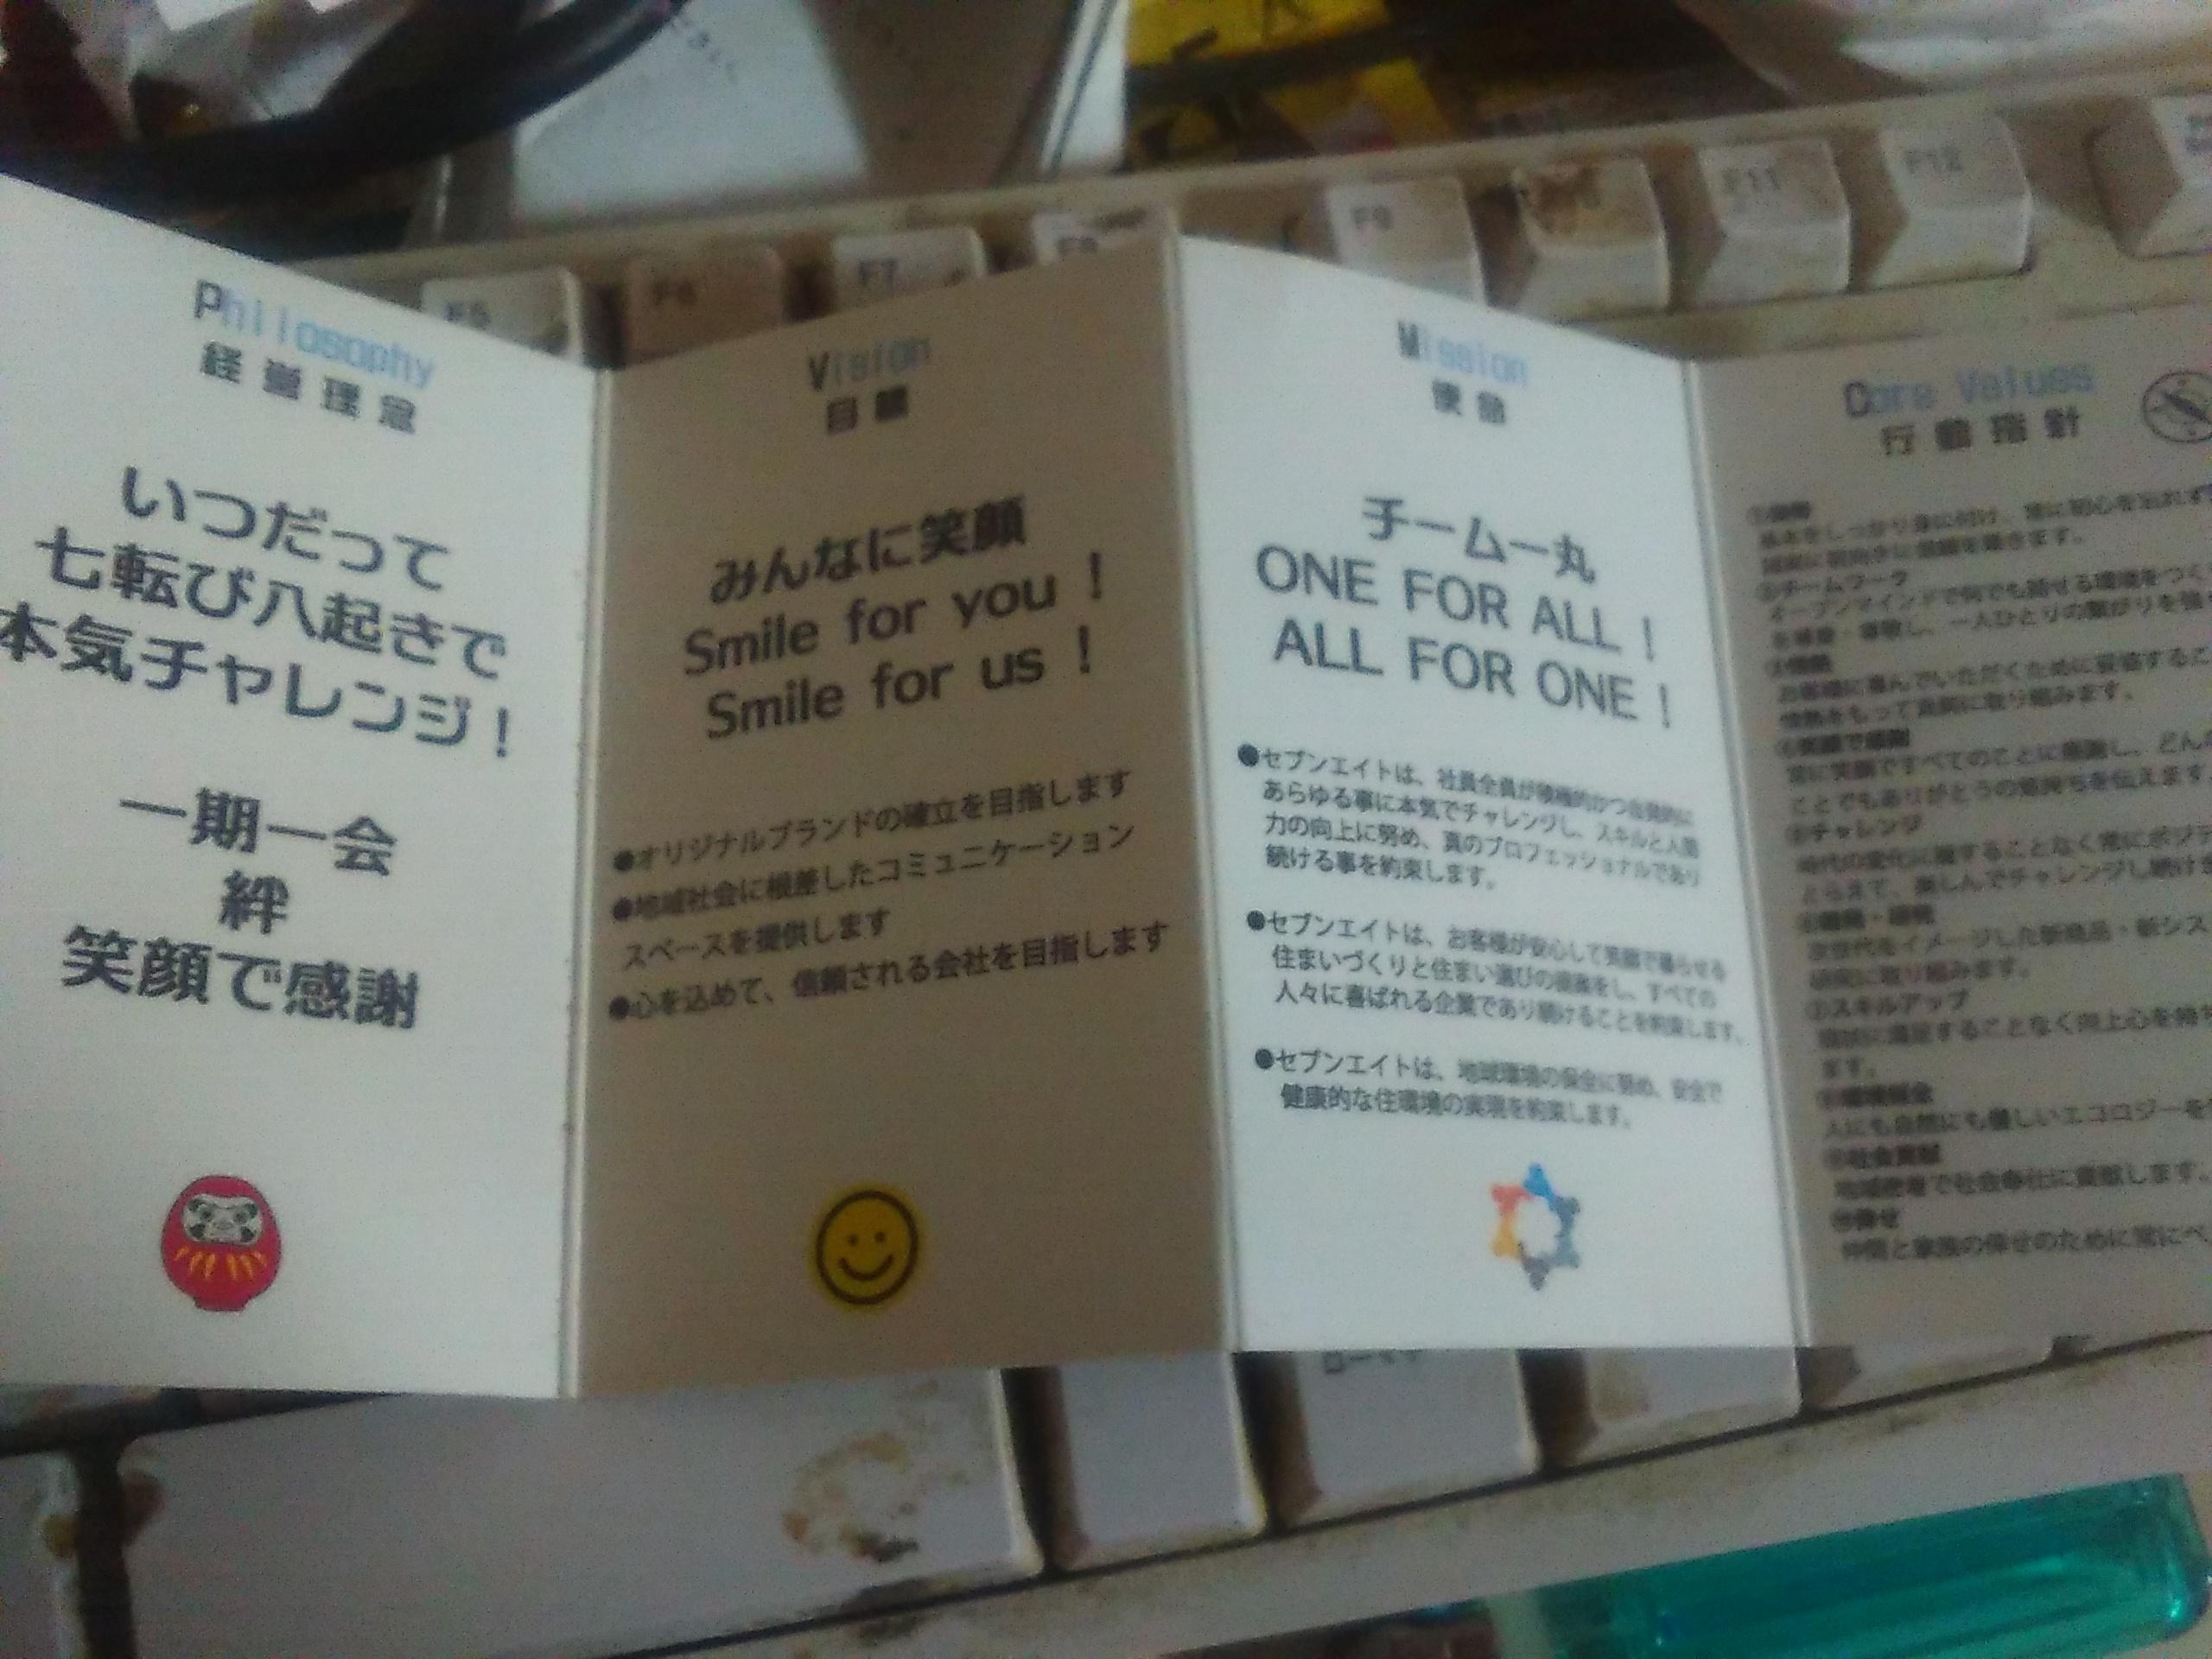 KIMG1030 - 武士道経営塾の集い